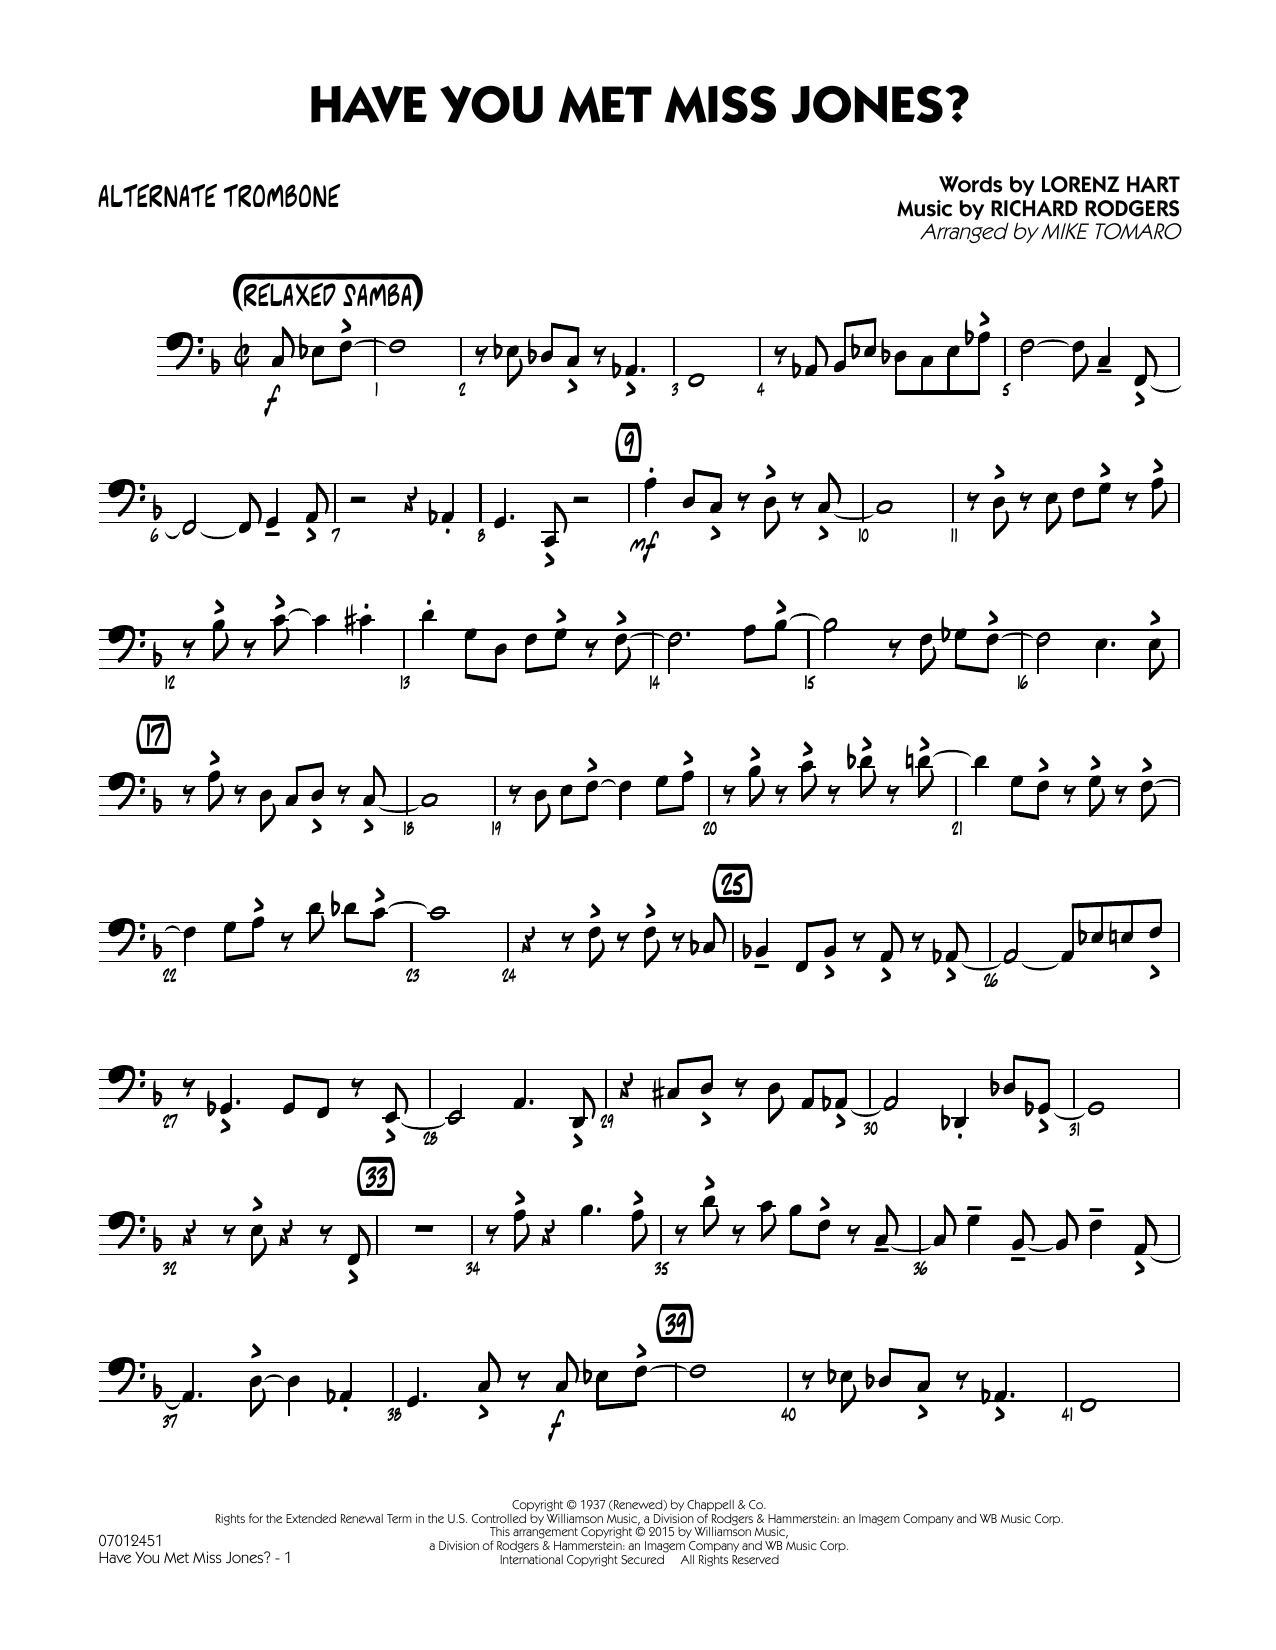 Have You Met Miss Jones? - Alternate Trombone (Jazz Ensemble)